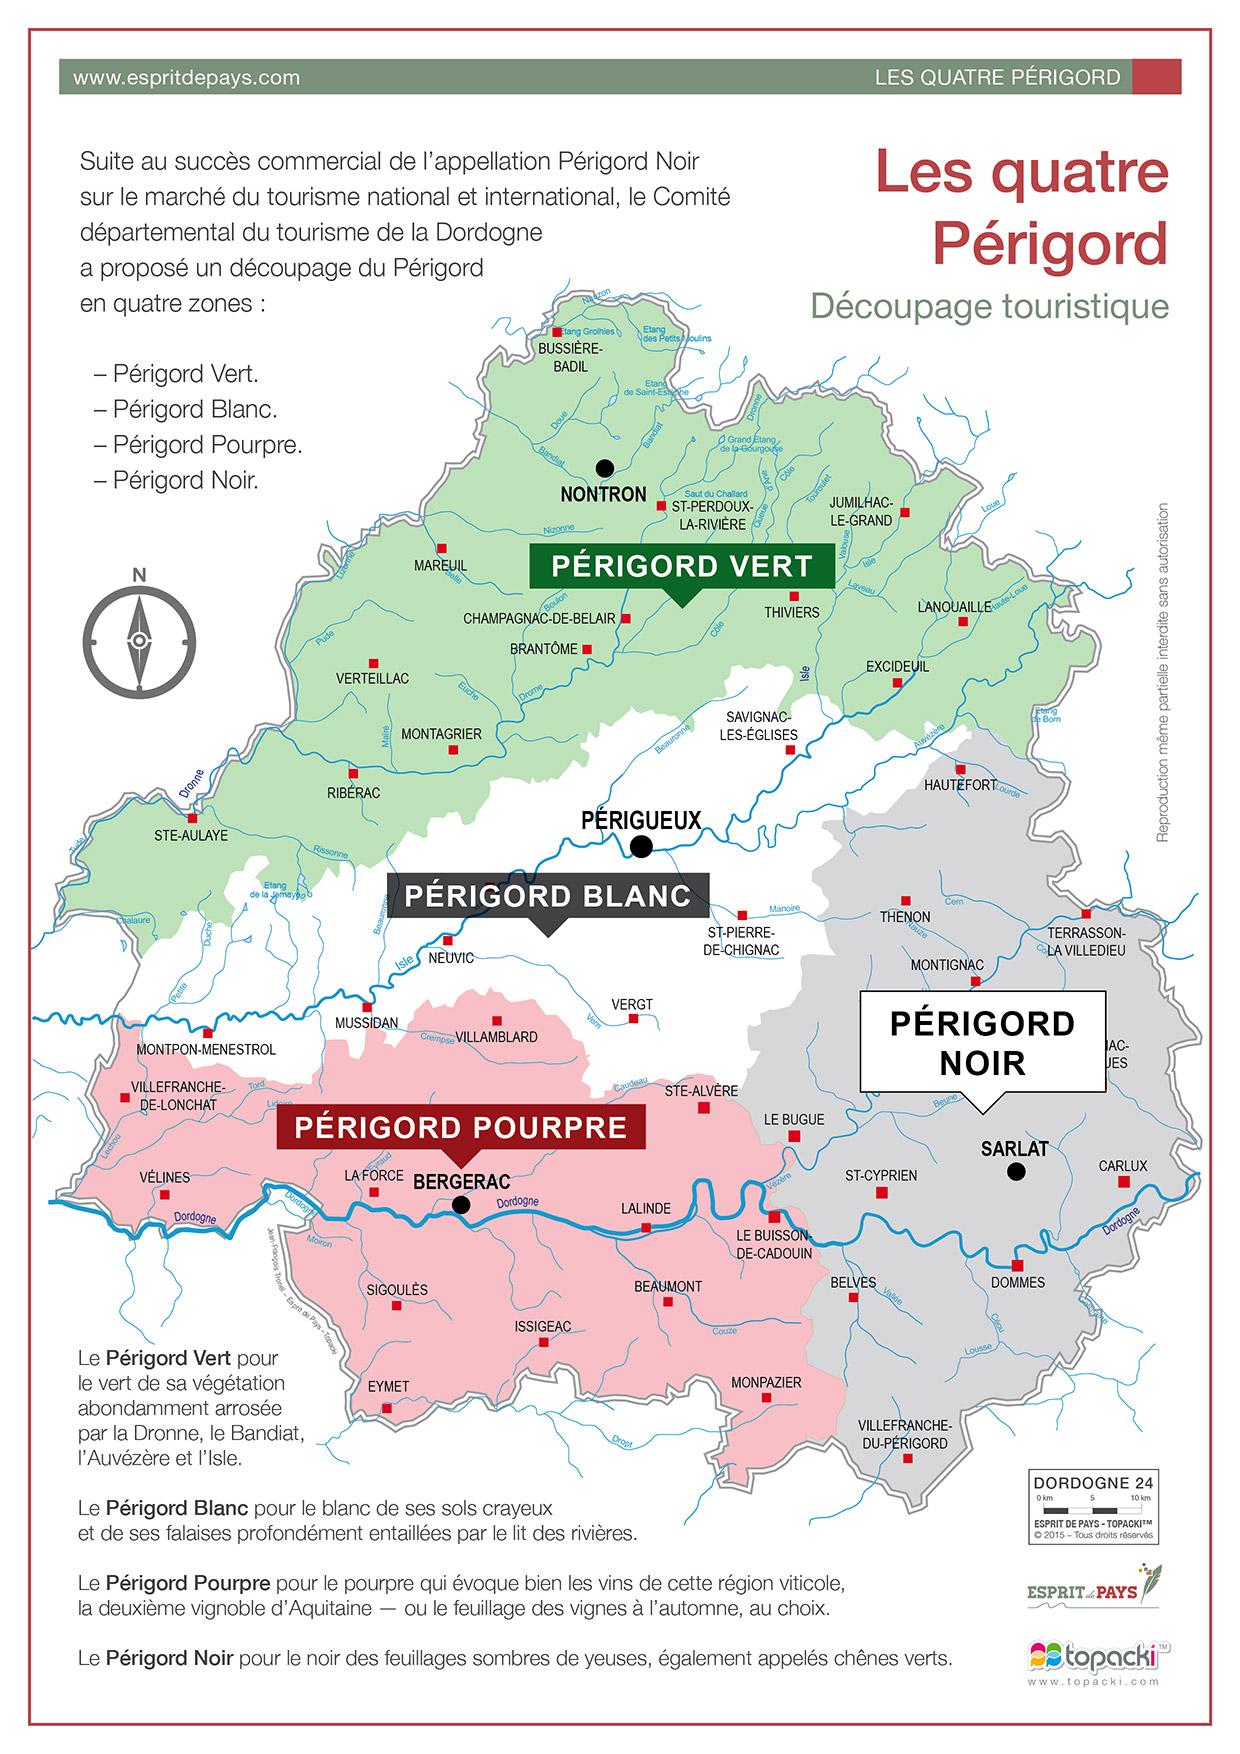 Cartographie : Les 4 Périgord touristiques